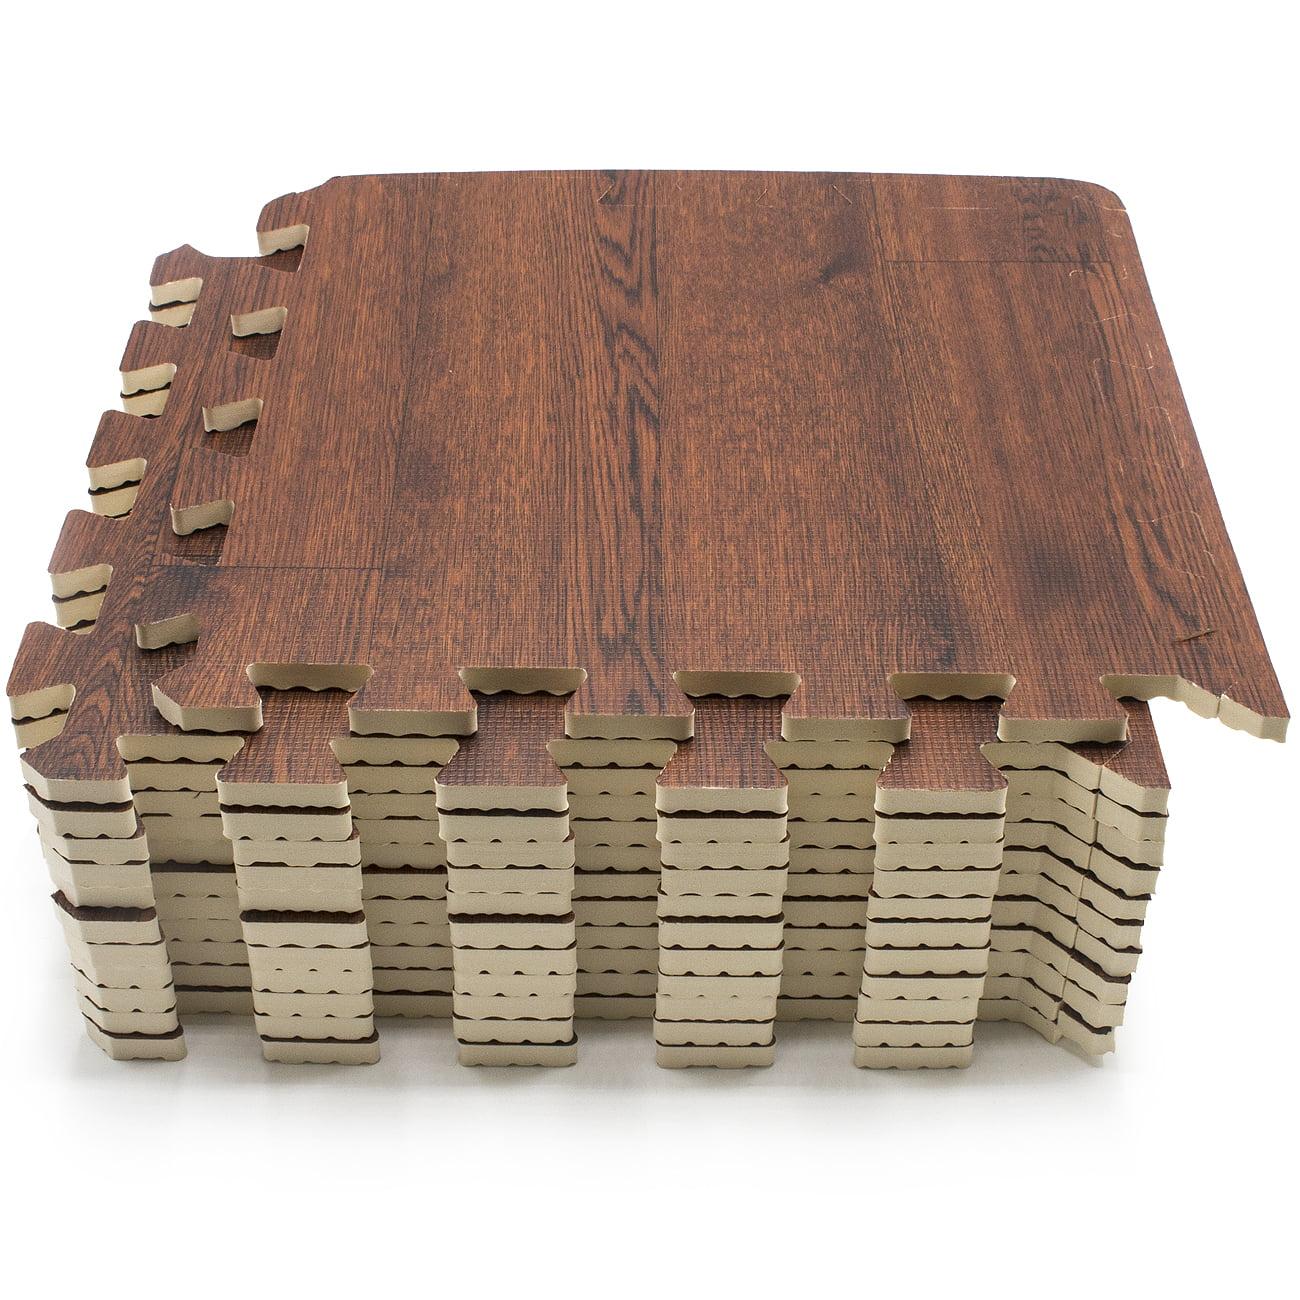 Sorbus Interlocking Floor Mat –Wood Print Multipurpose Foam Tile Flooring – Home, Office, Playroom (9 Tiles, 9 Sq ft, Gray)